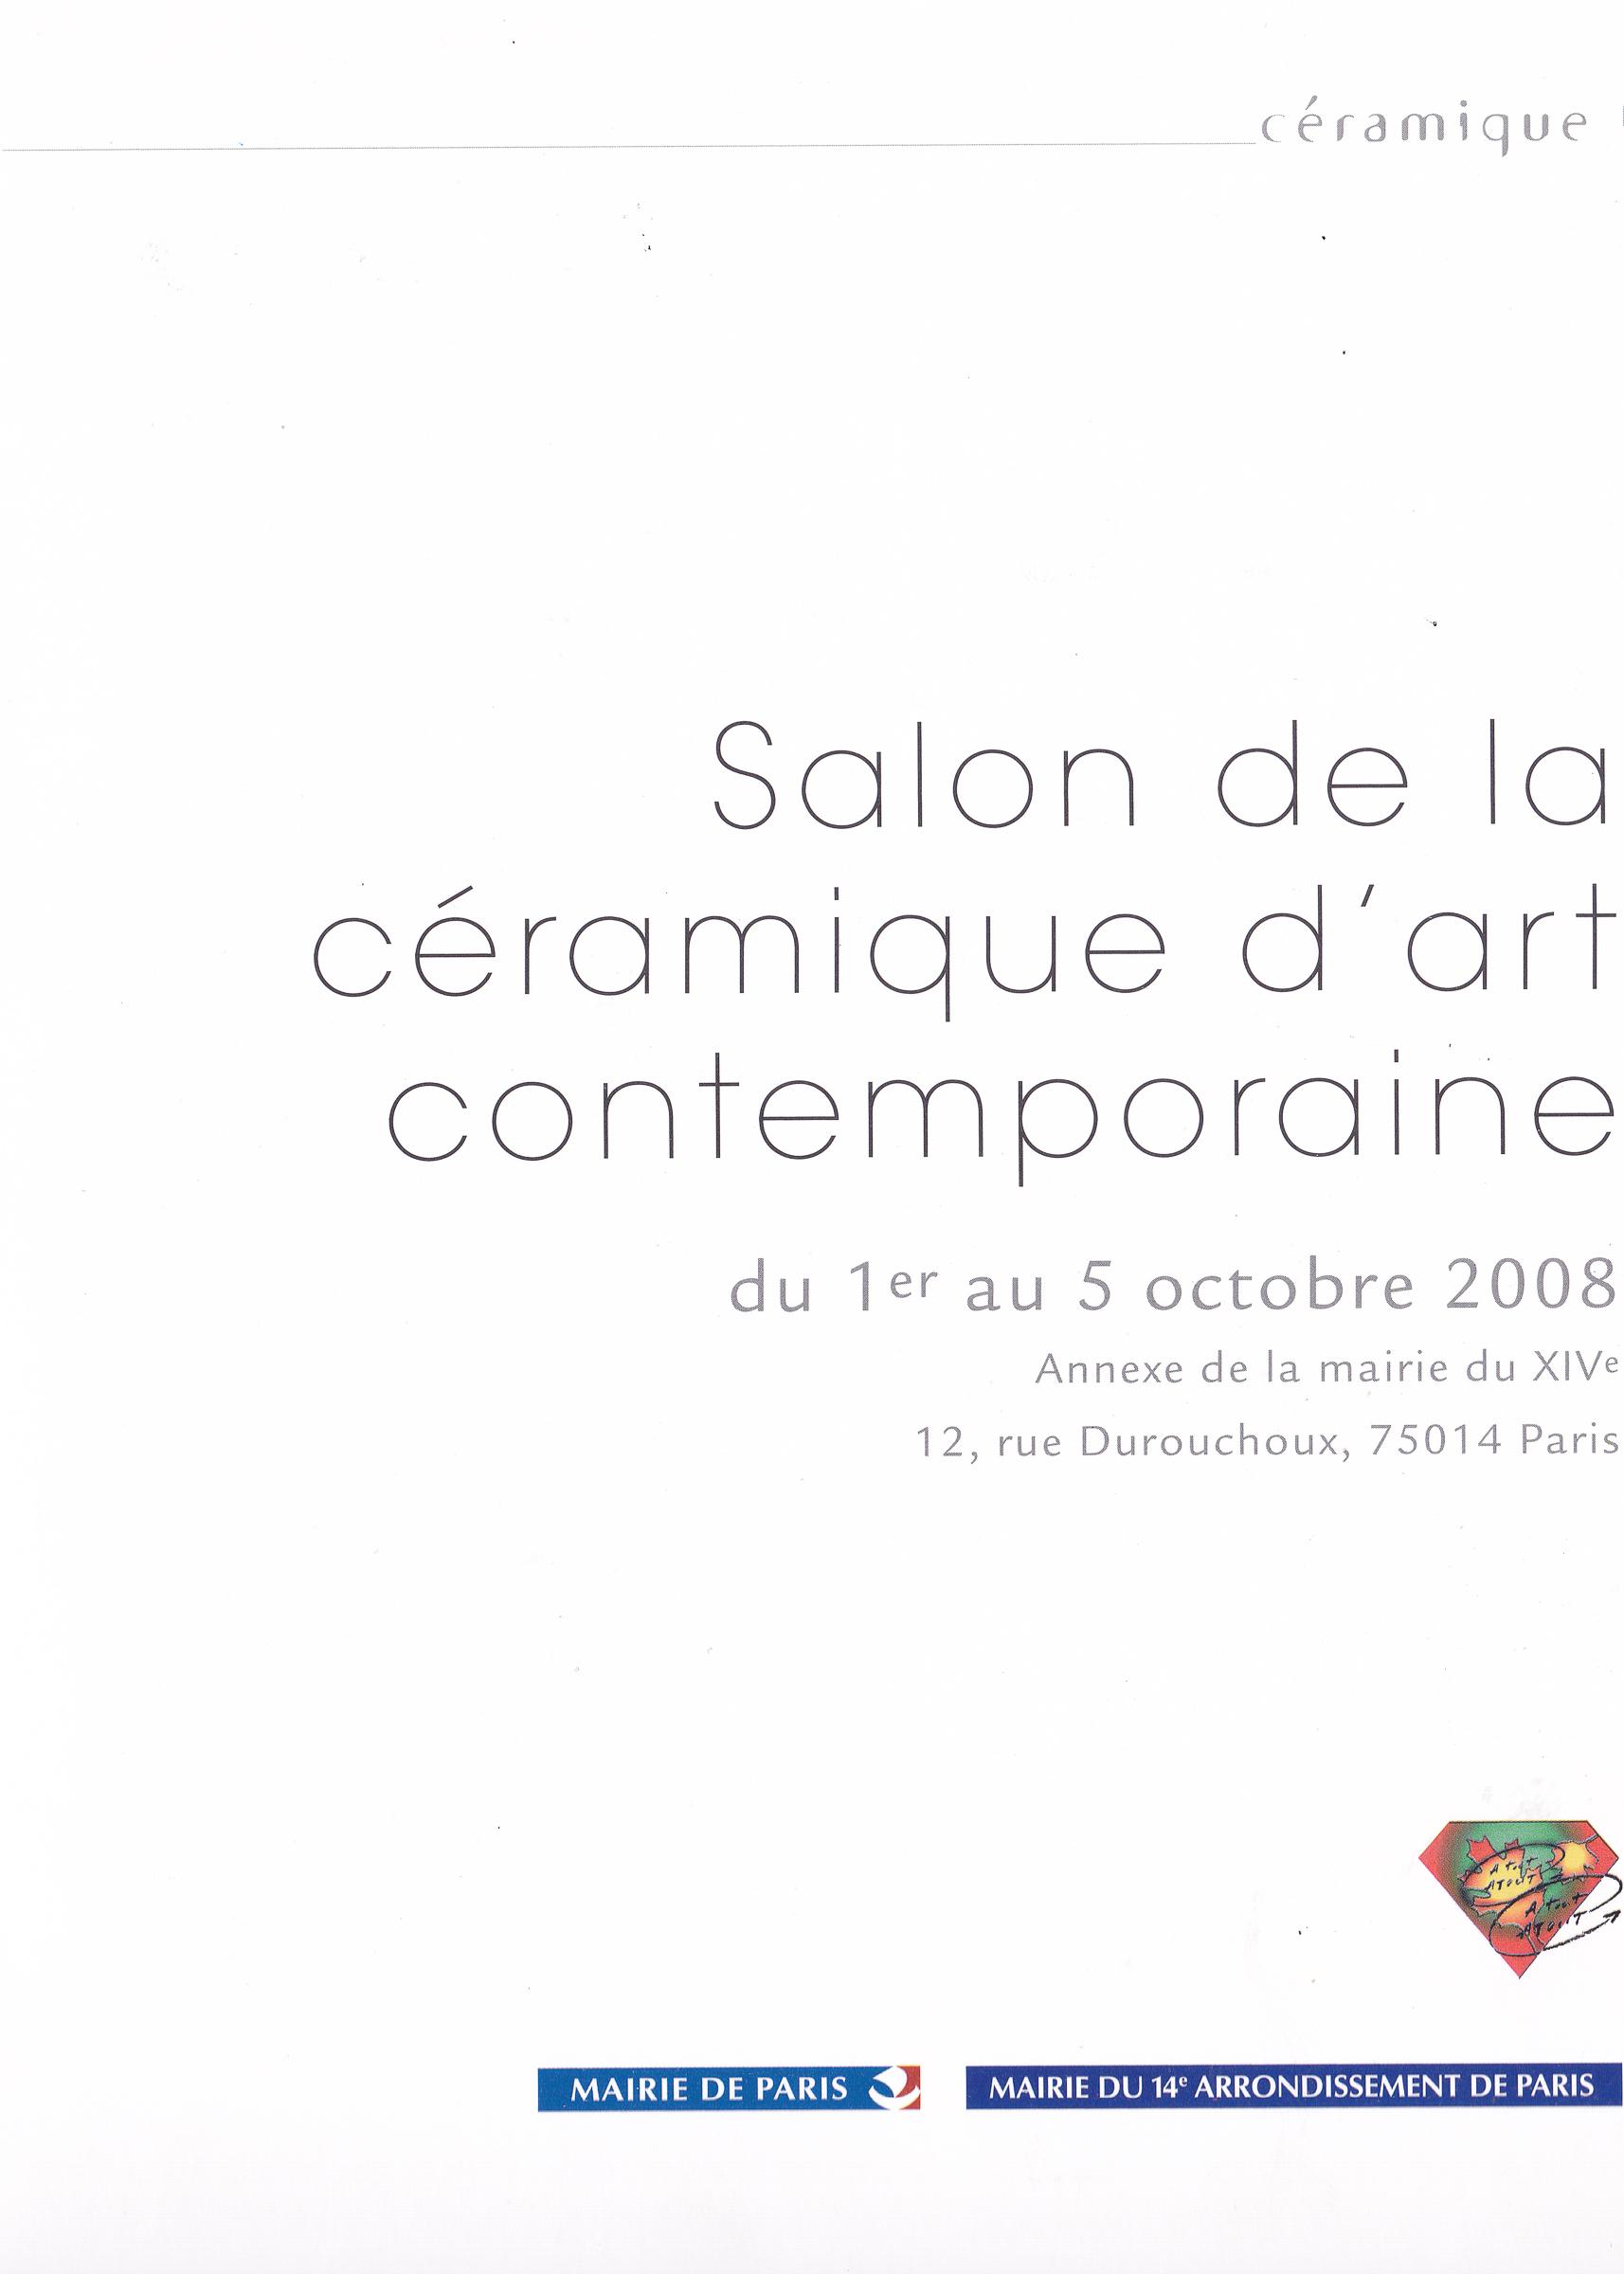 gallery 2008 cer 14 copy-2.jpg